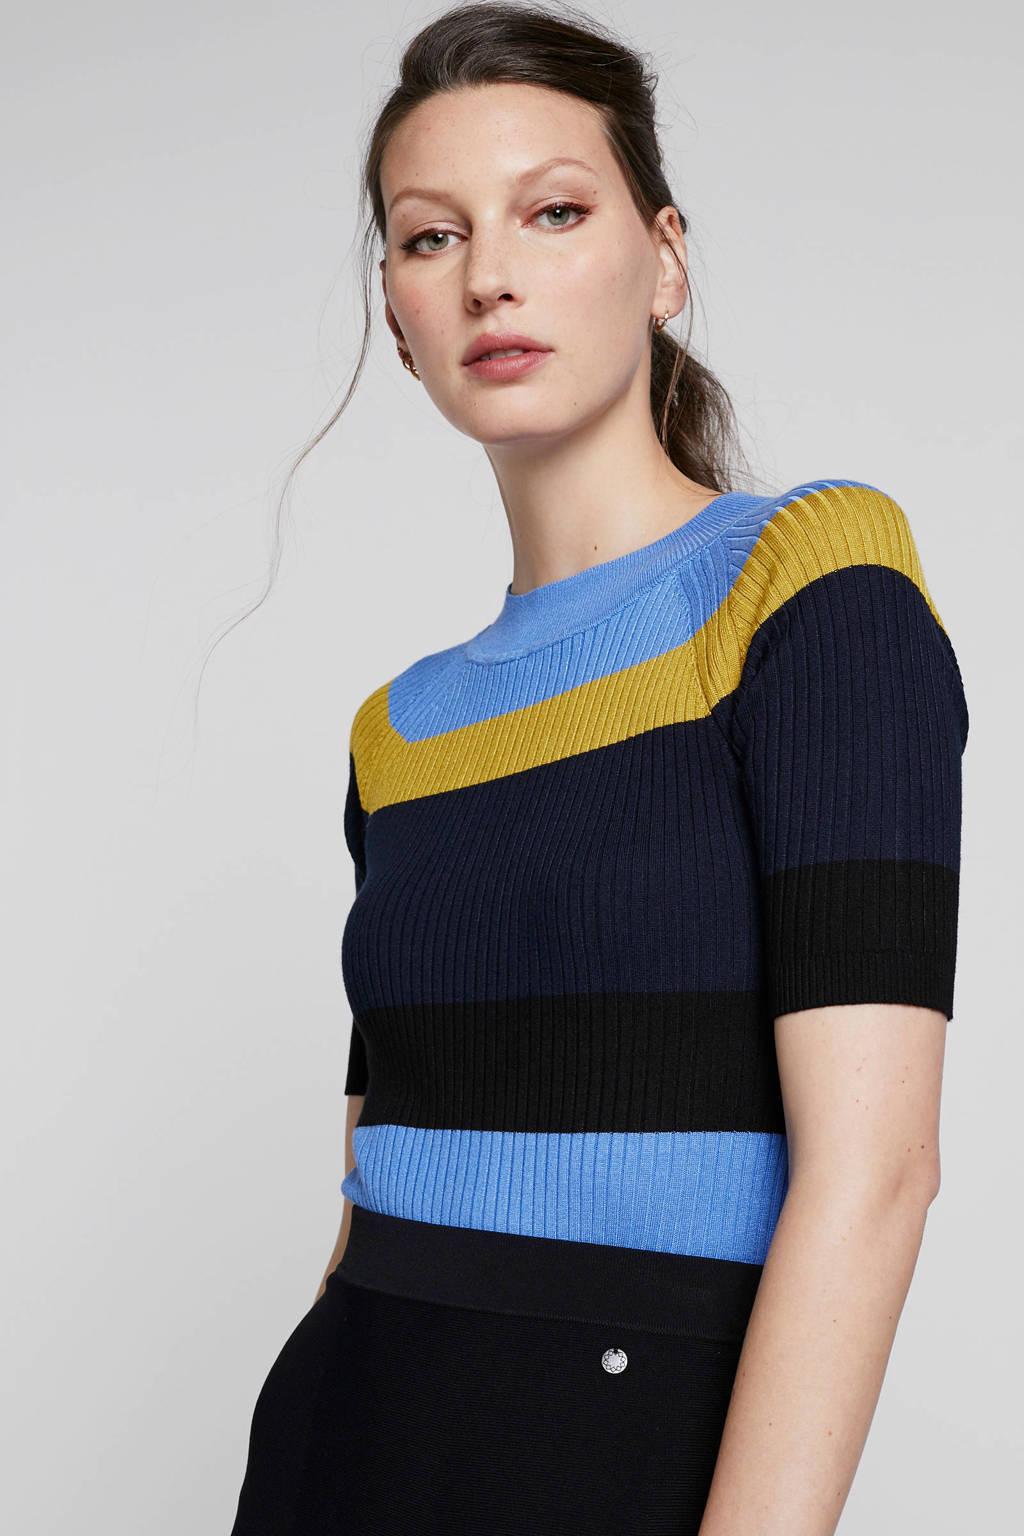 NÜMPH gestreepte top Alexene zwart/blauw/geel, Zwart/blauw/geel